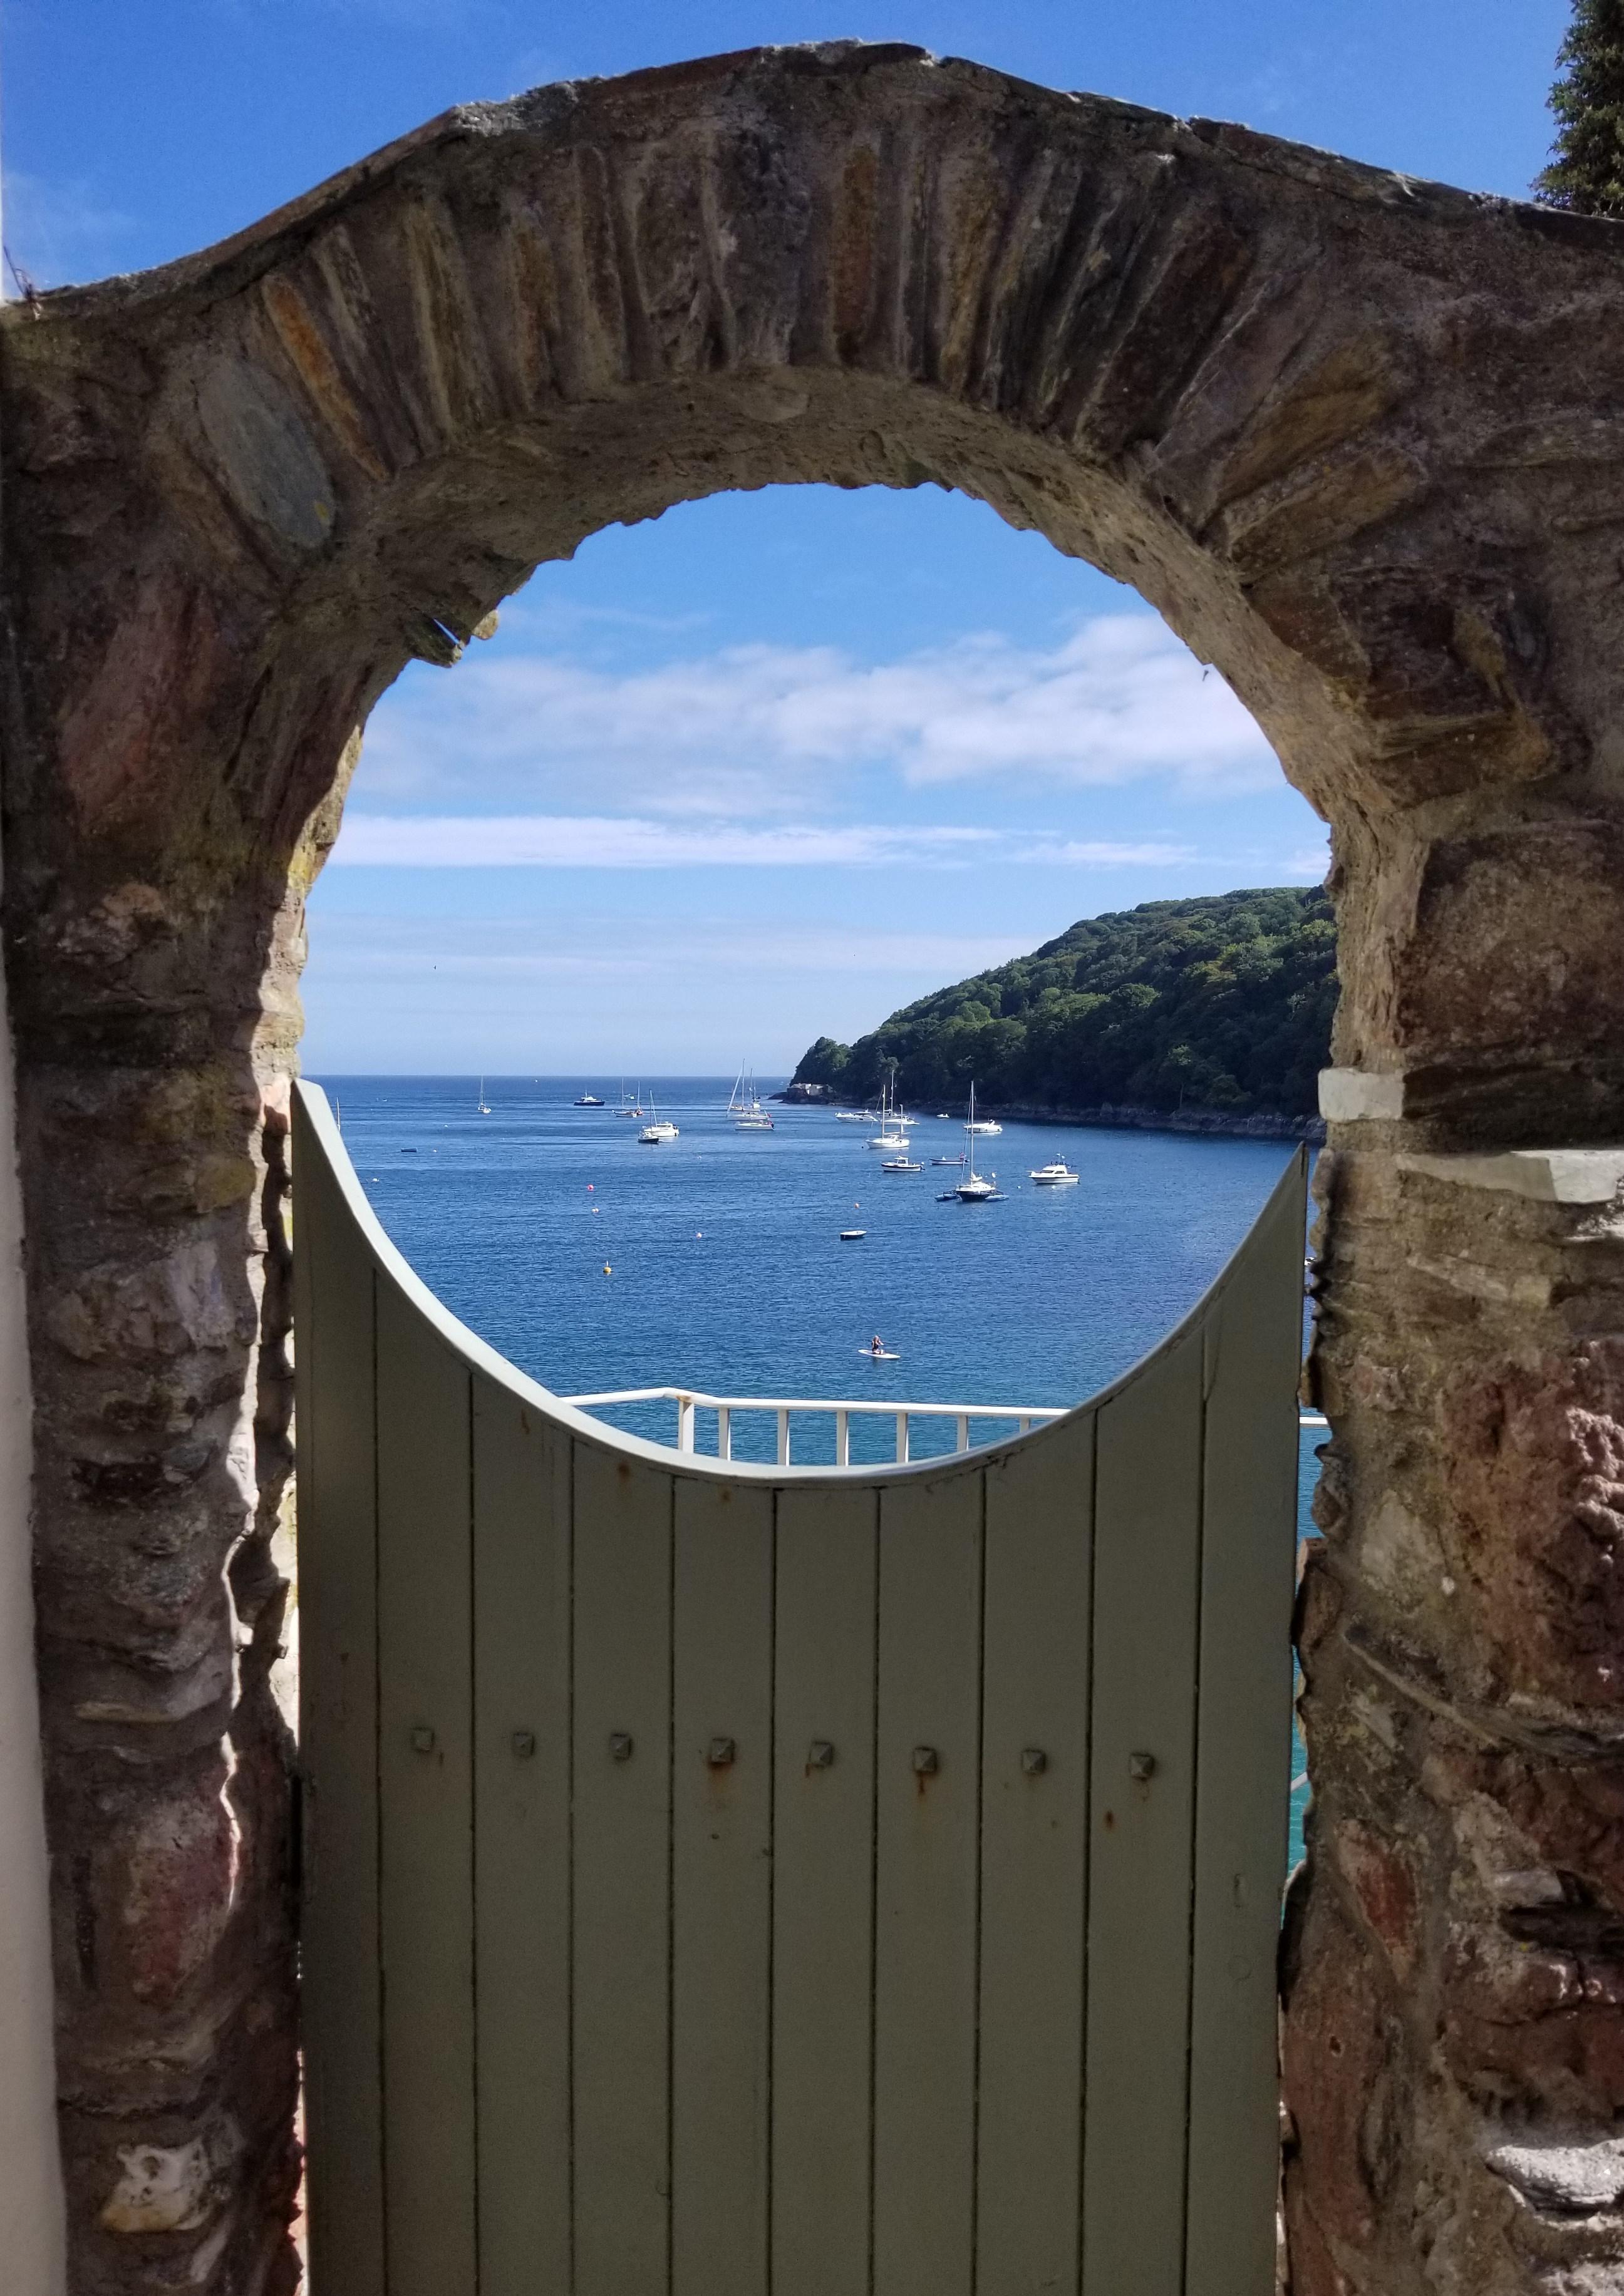 window-onto-the-sea-cornwall-e1540075120823.jpg